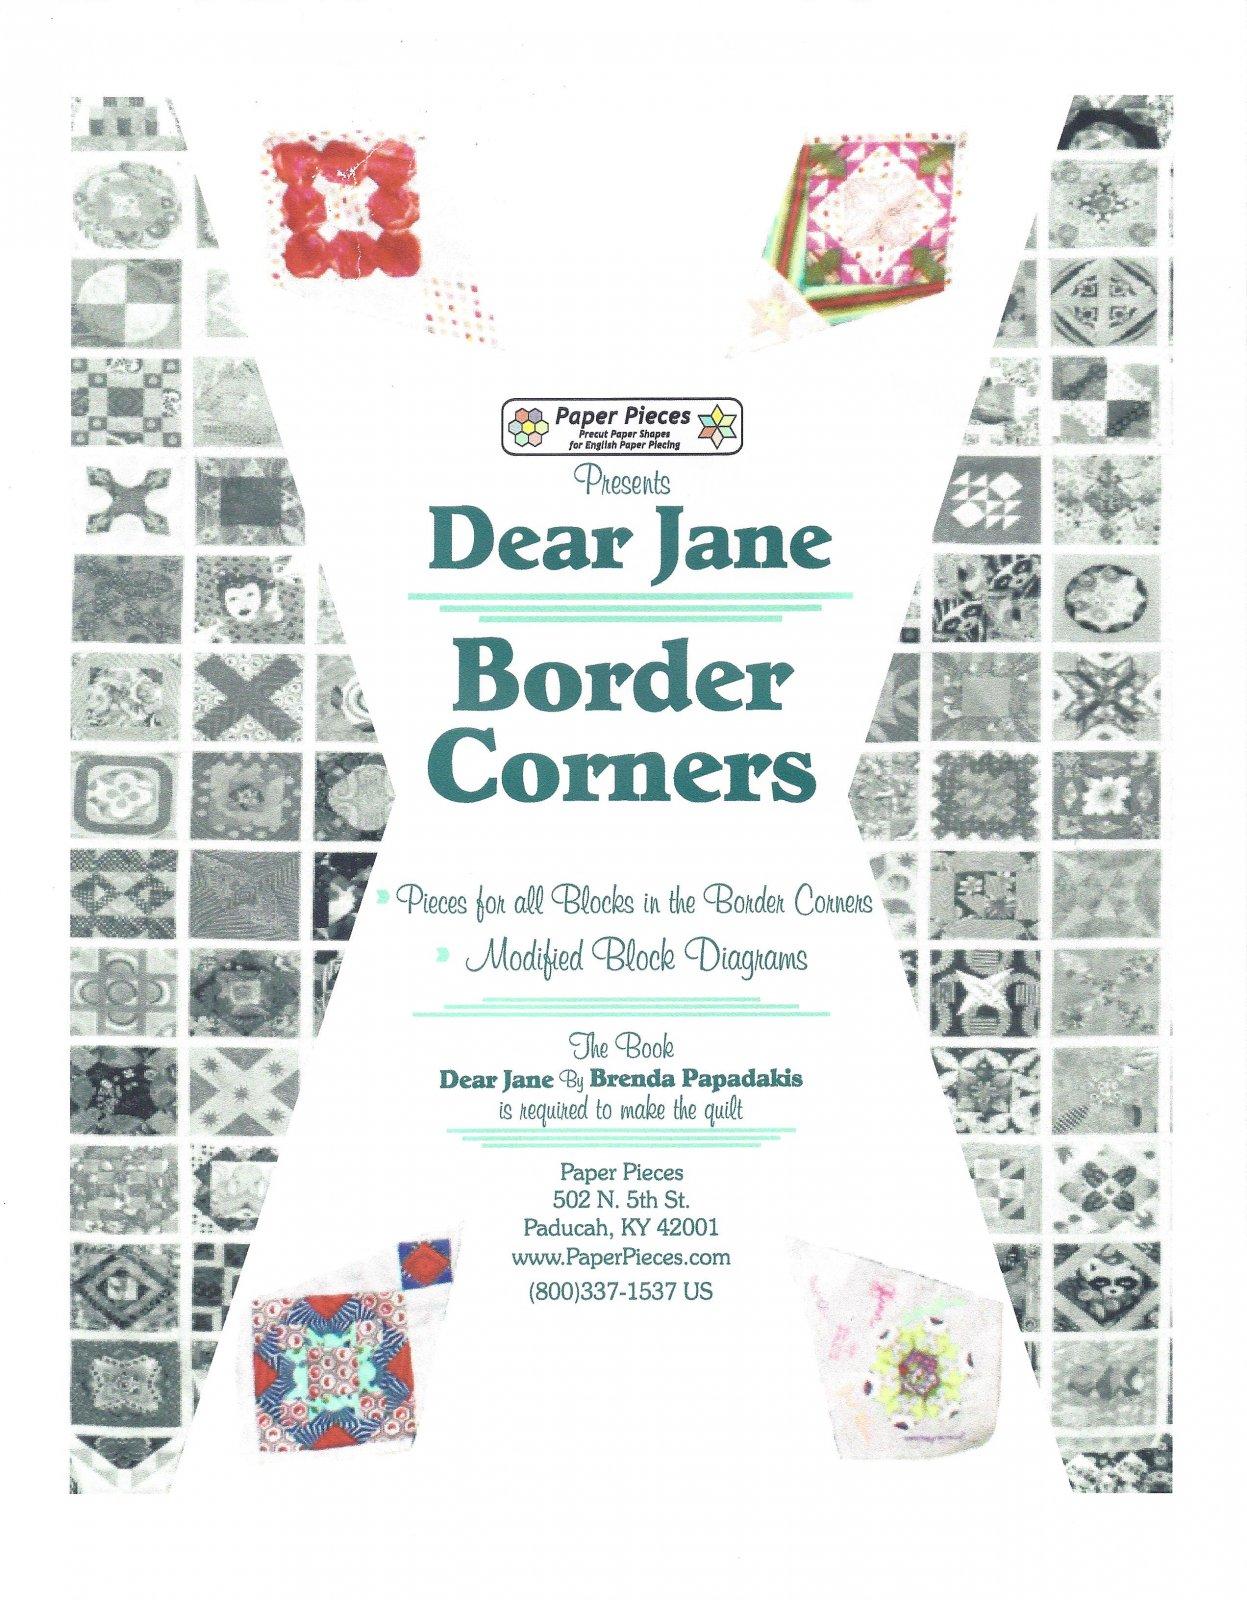 Dear Jane (Border Corners) EPP Paper Pieces Kit